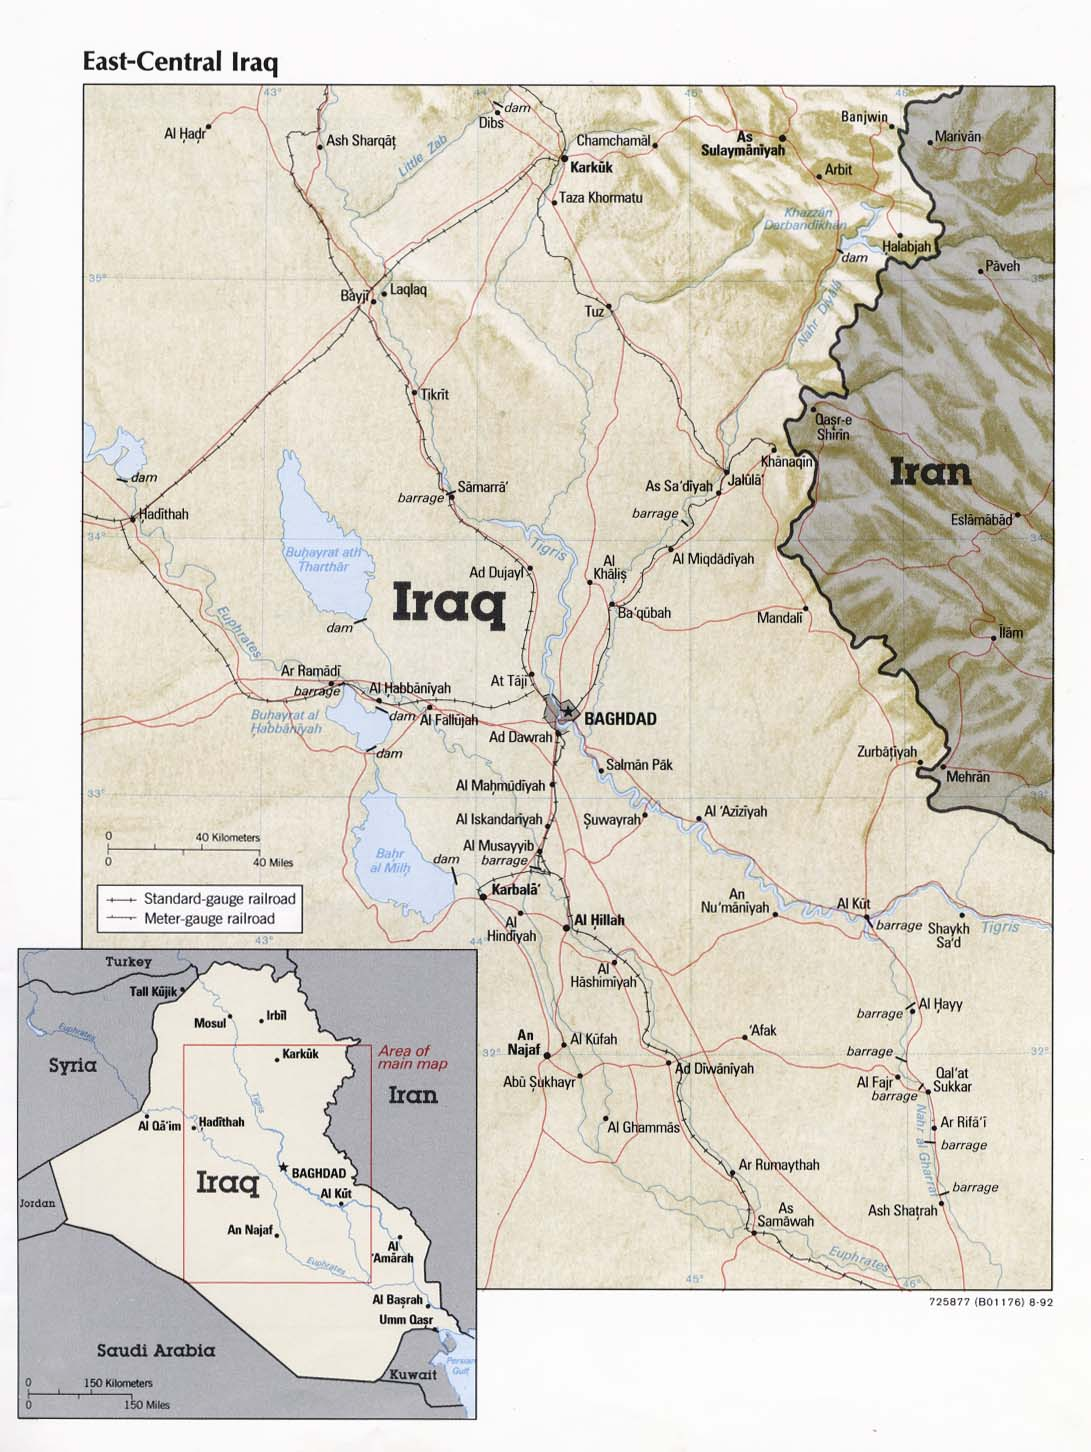 east central iraq from iraq a map folio cia 1992